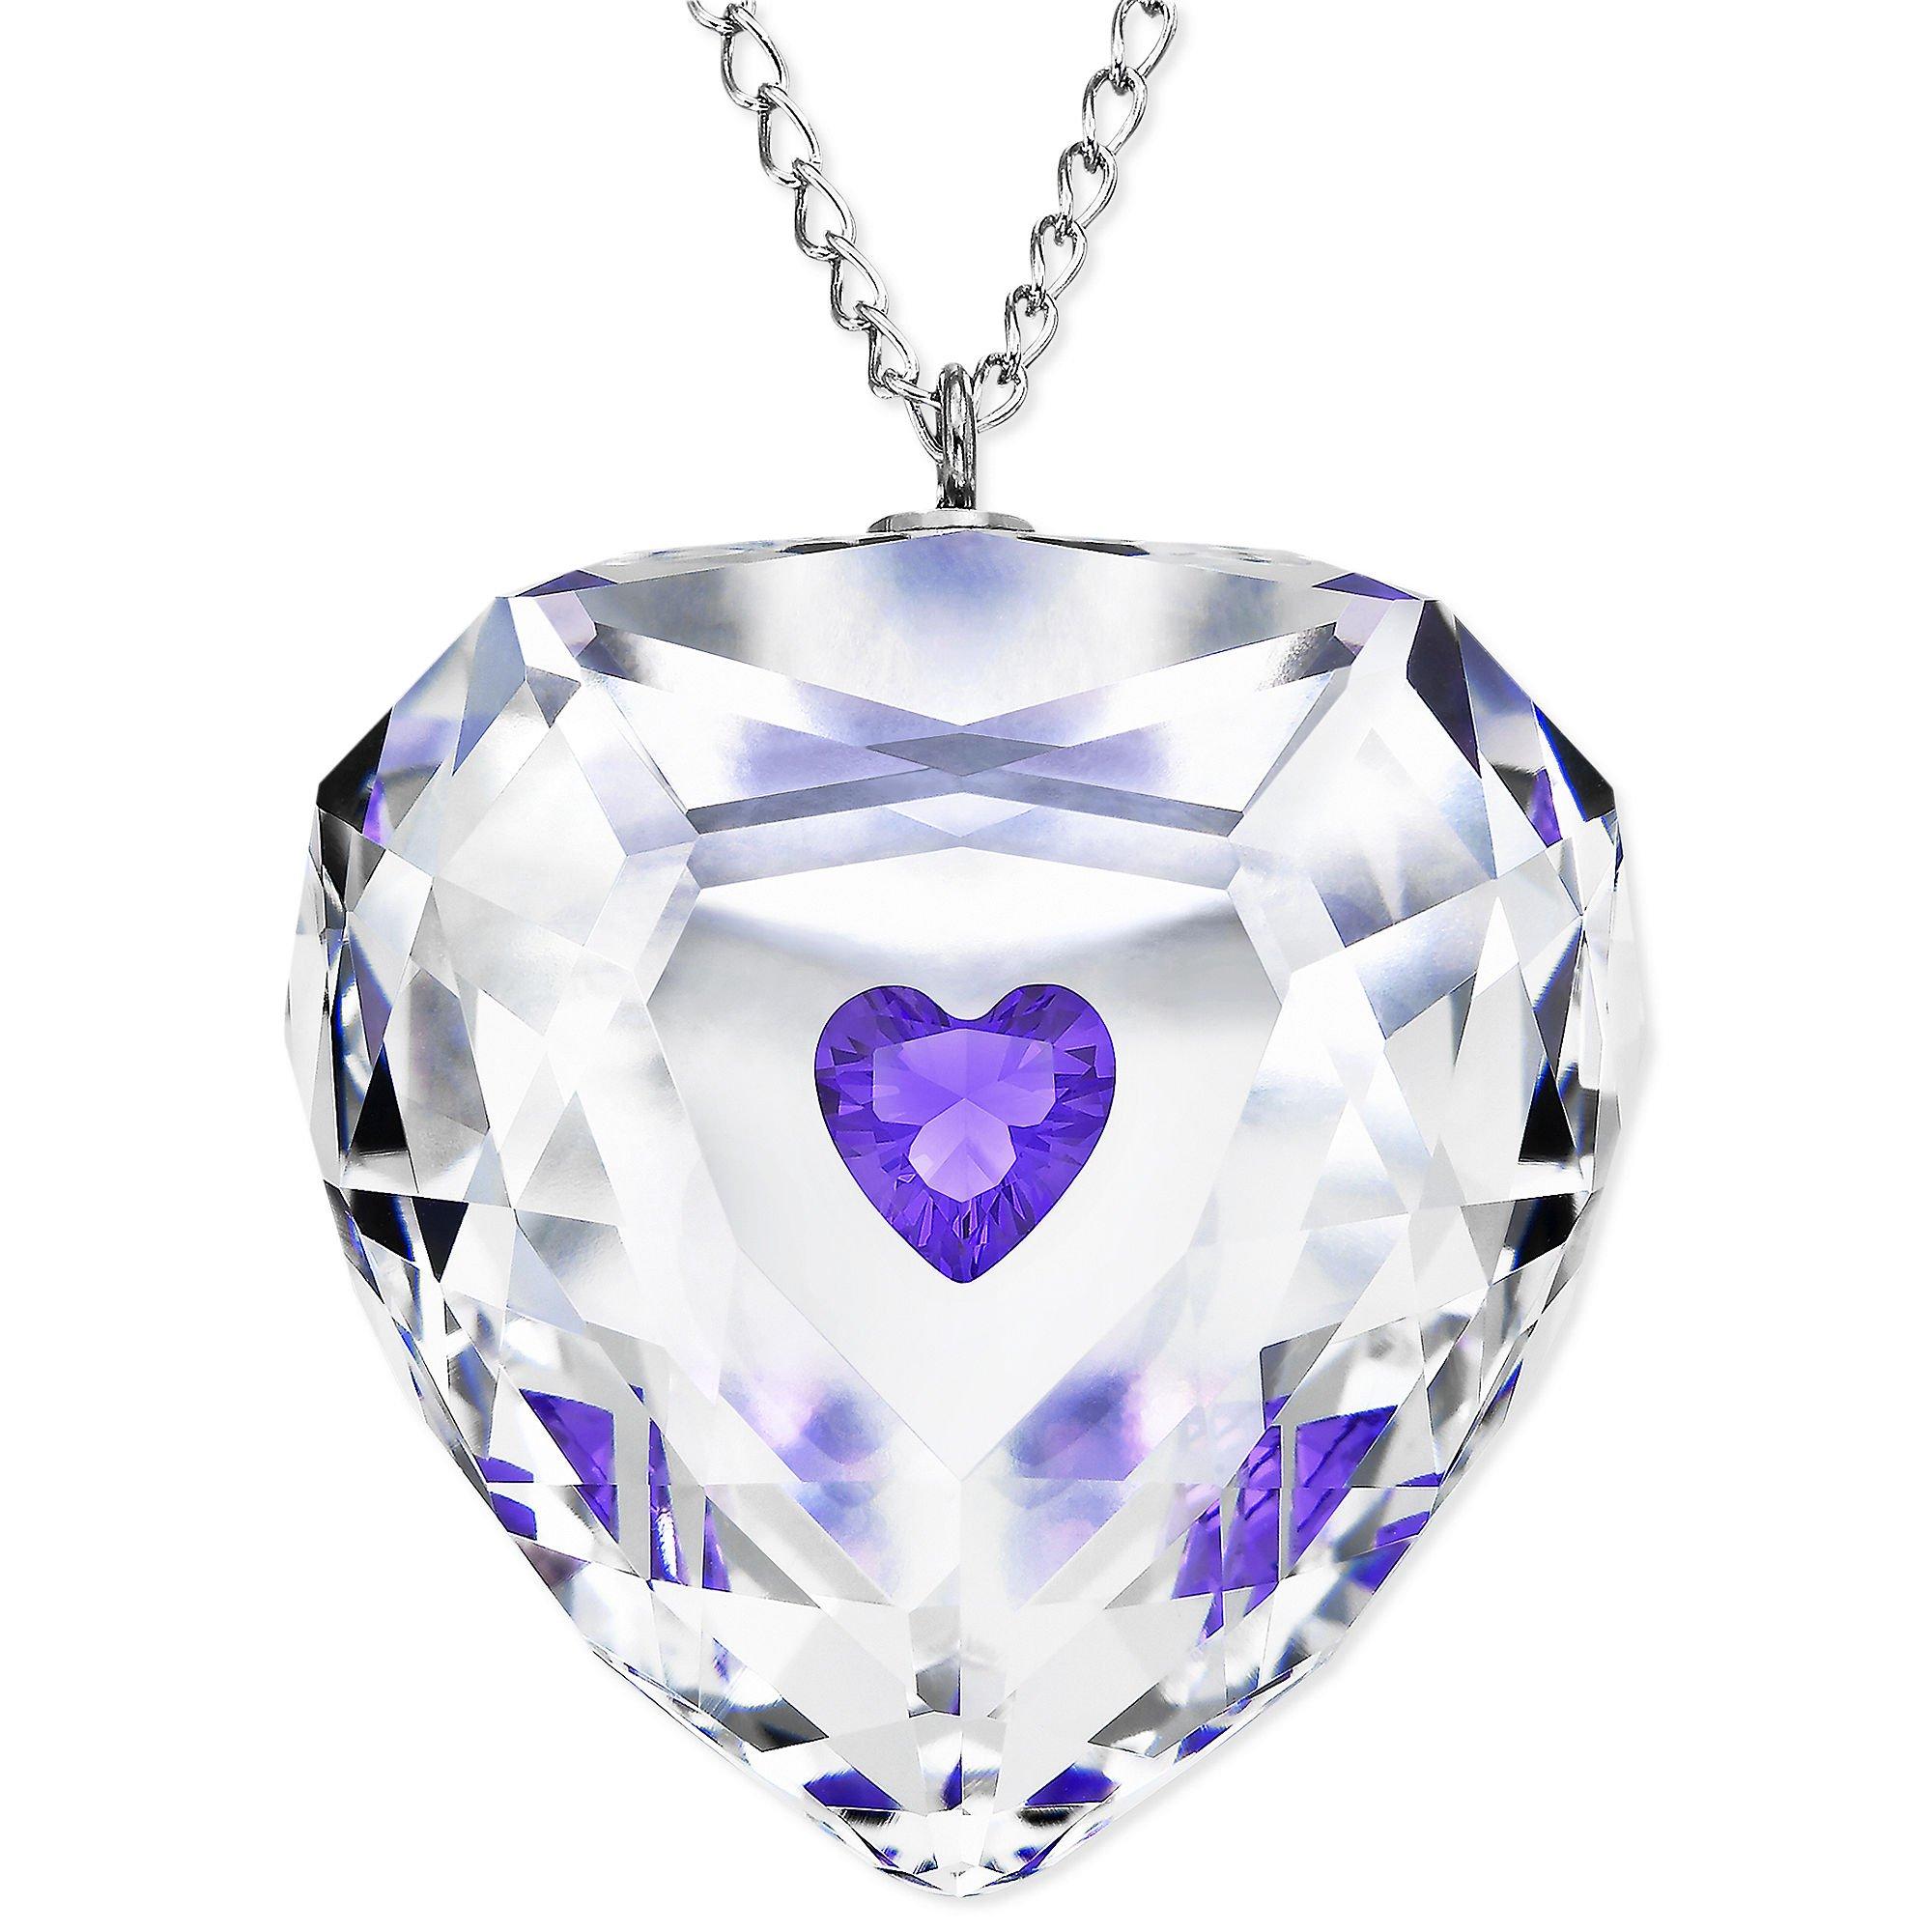 swarovski rhodium plated violet truthful heart crystal. Black Bedroom Furniture Sets. Home Design Ideas